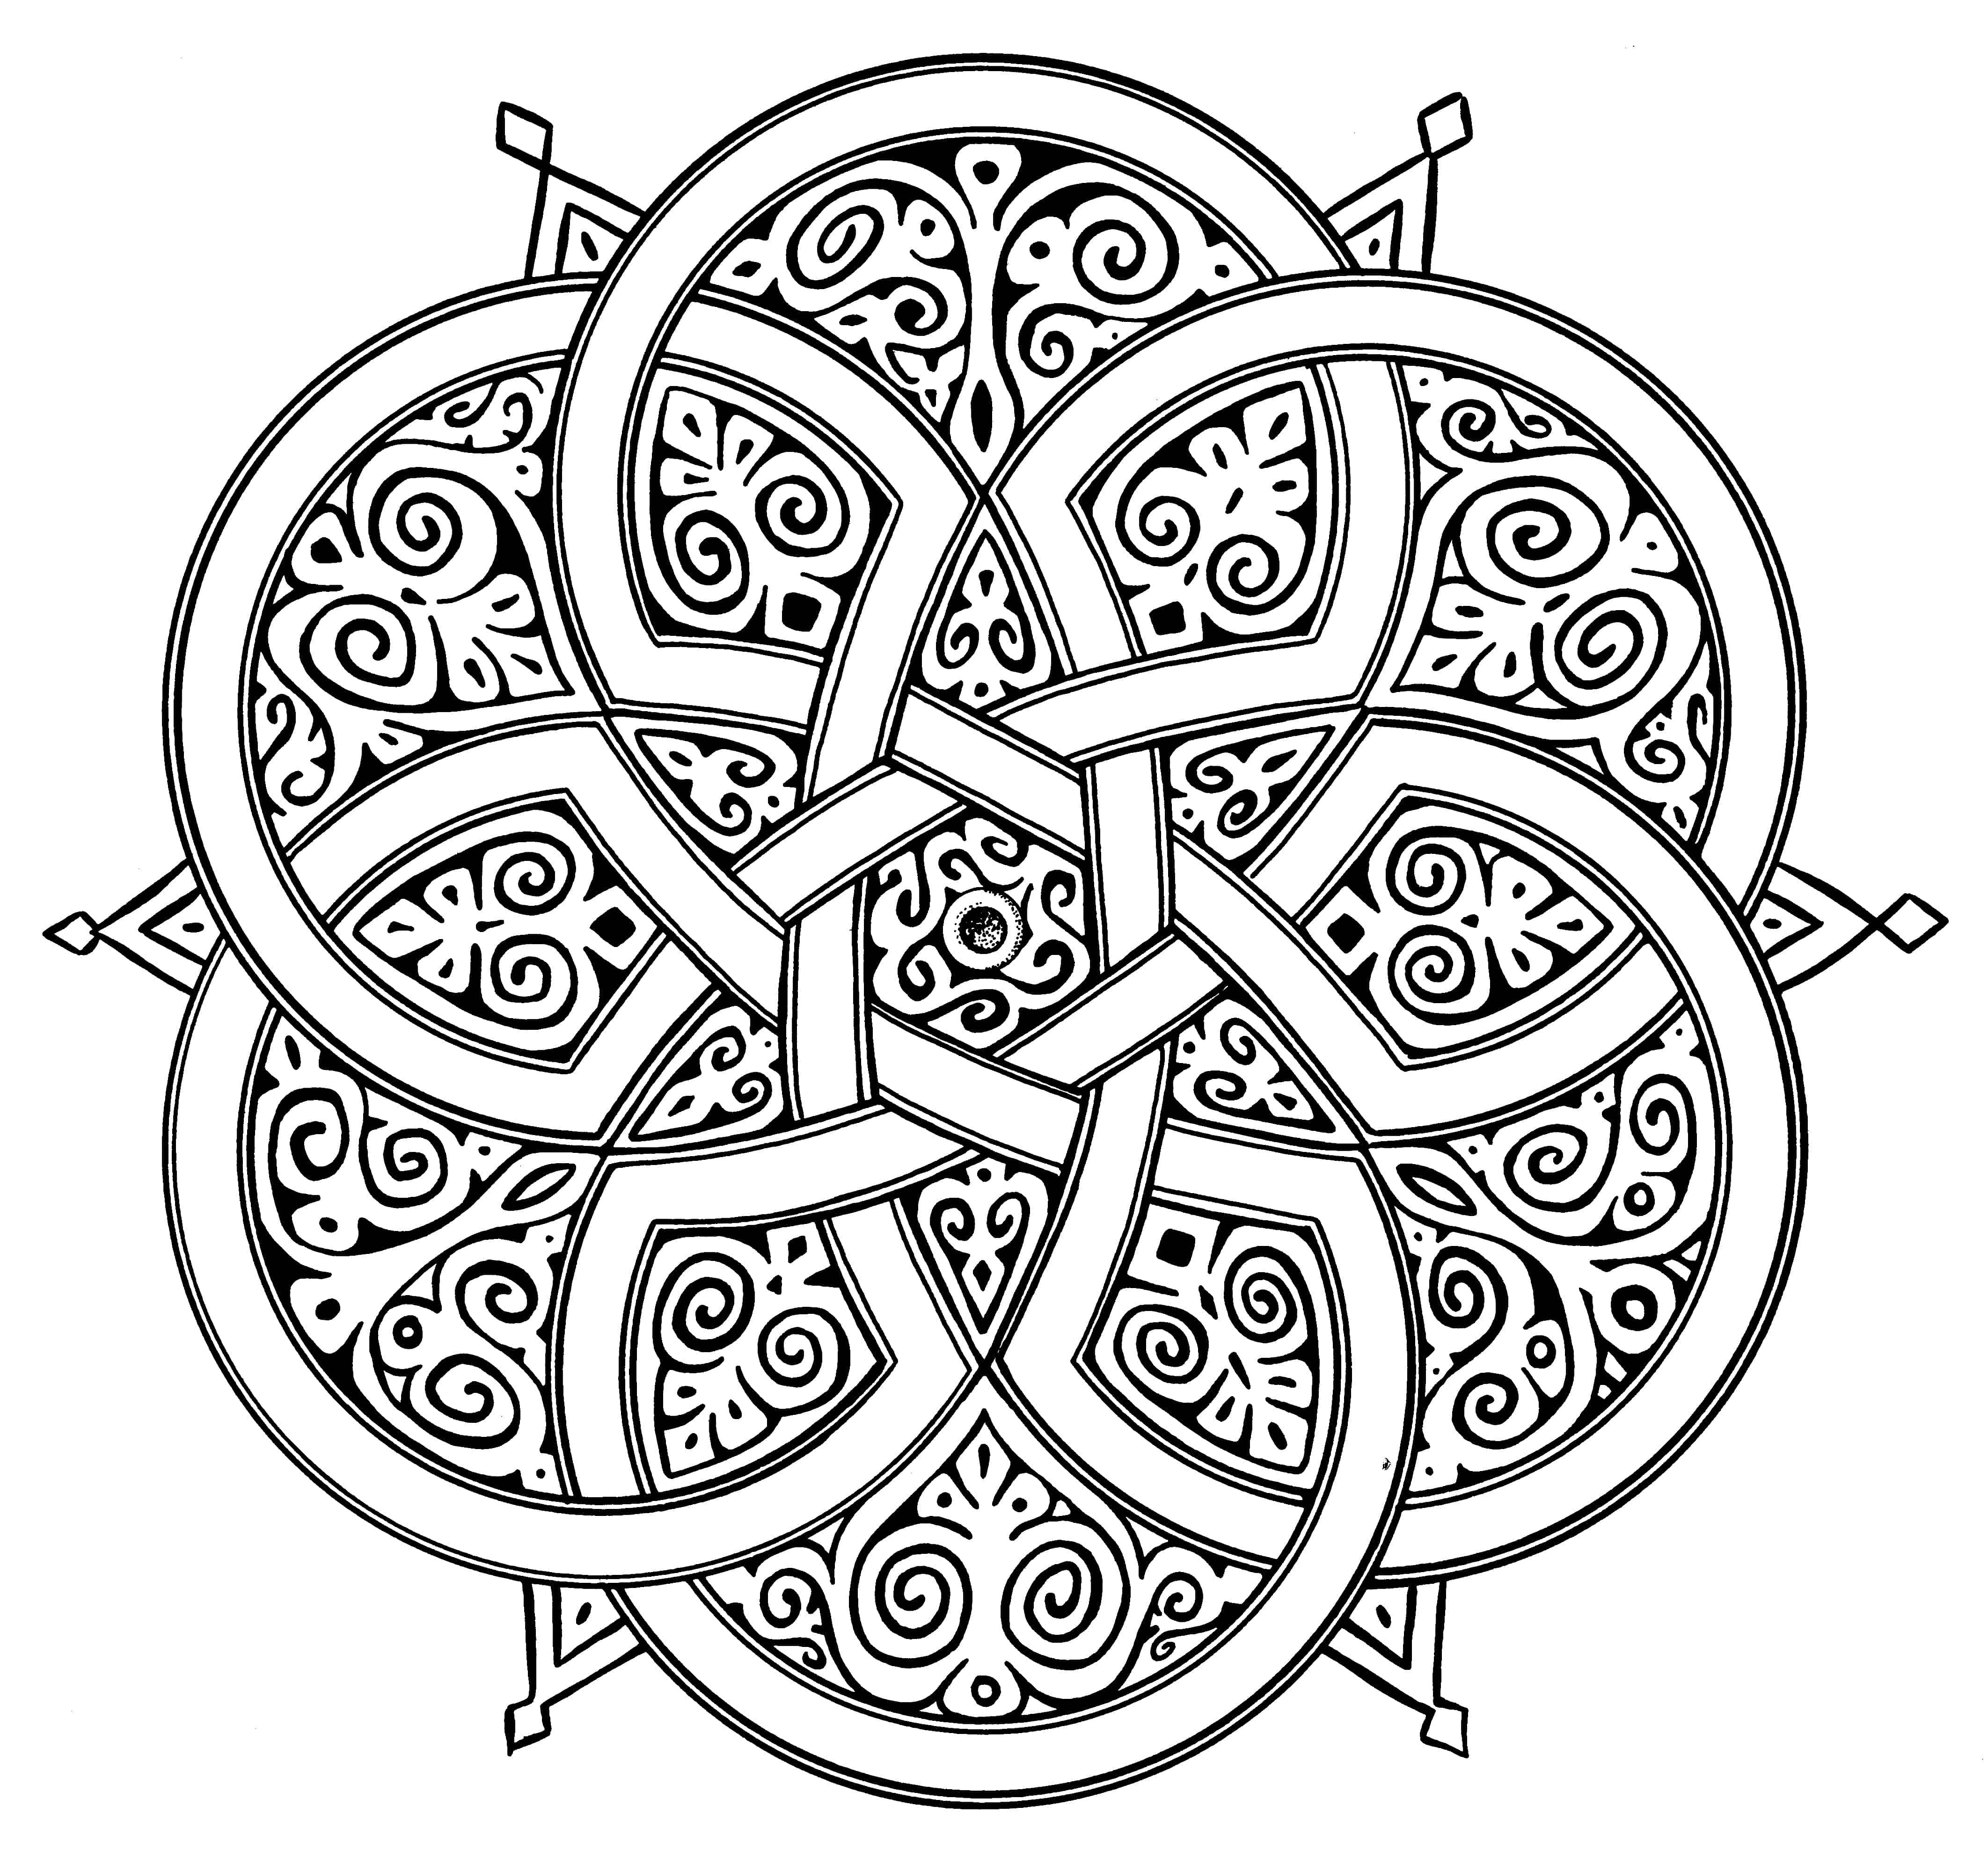 Islamic Art Geometric Designs Sketch Coloring Page